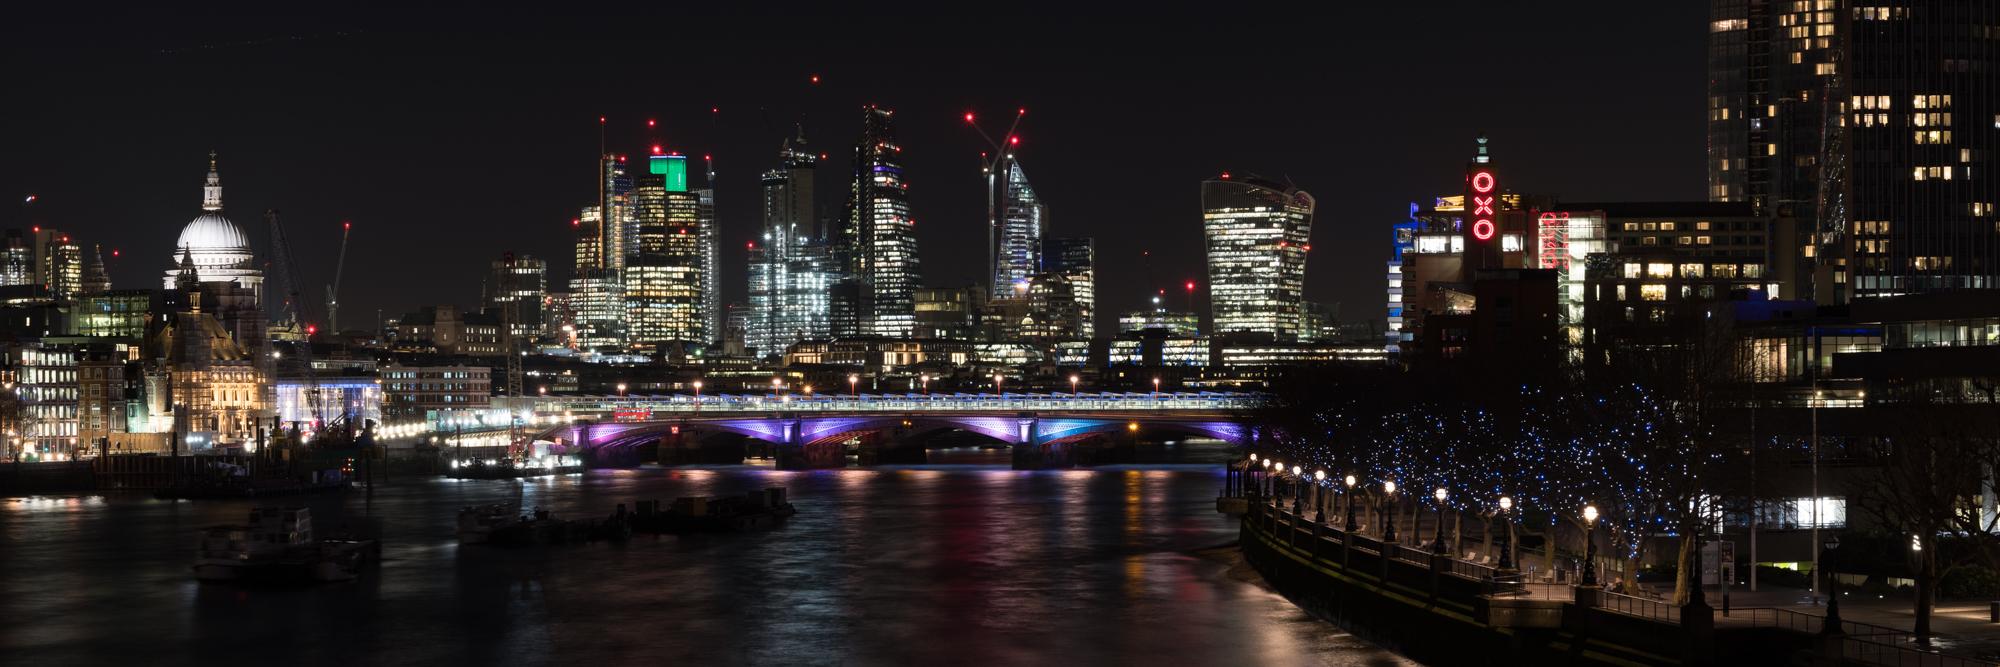 London panoramic photo at night by Trevor Sherwin